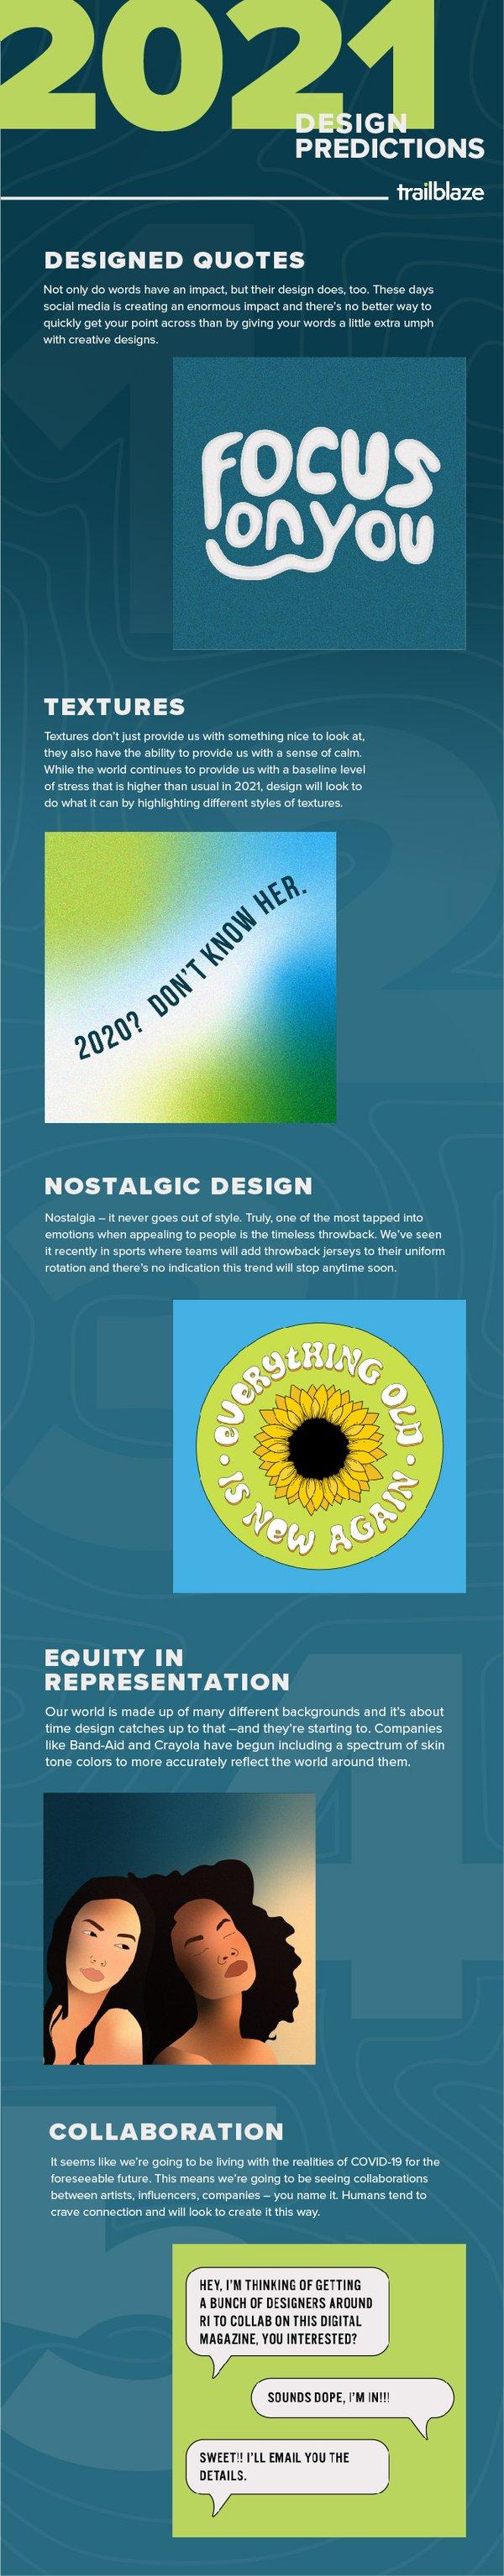 Design Trend Predictions for 2021; Designed Quotes; Textures; Nostalgic Design; Equity in Representation; Collaboration